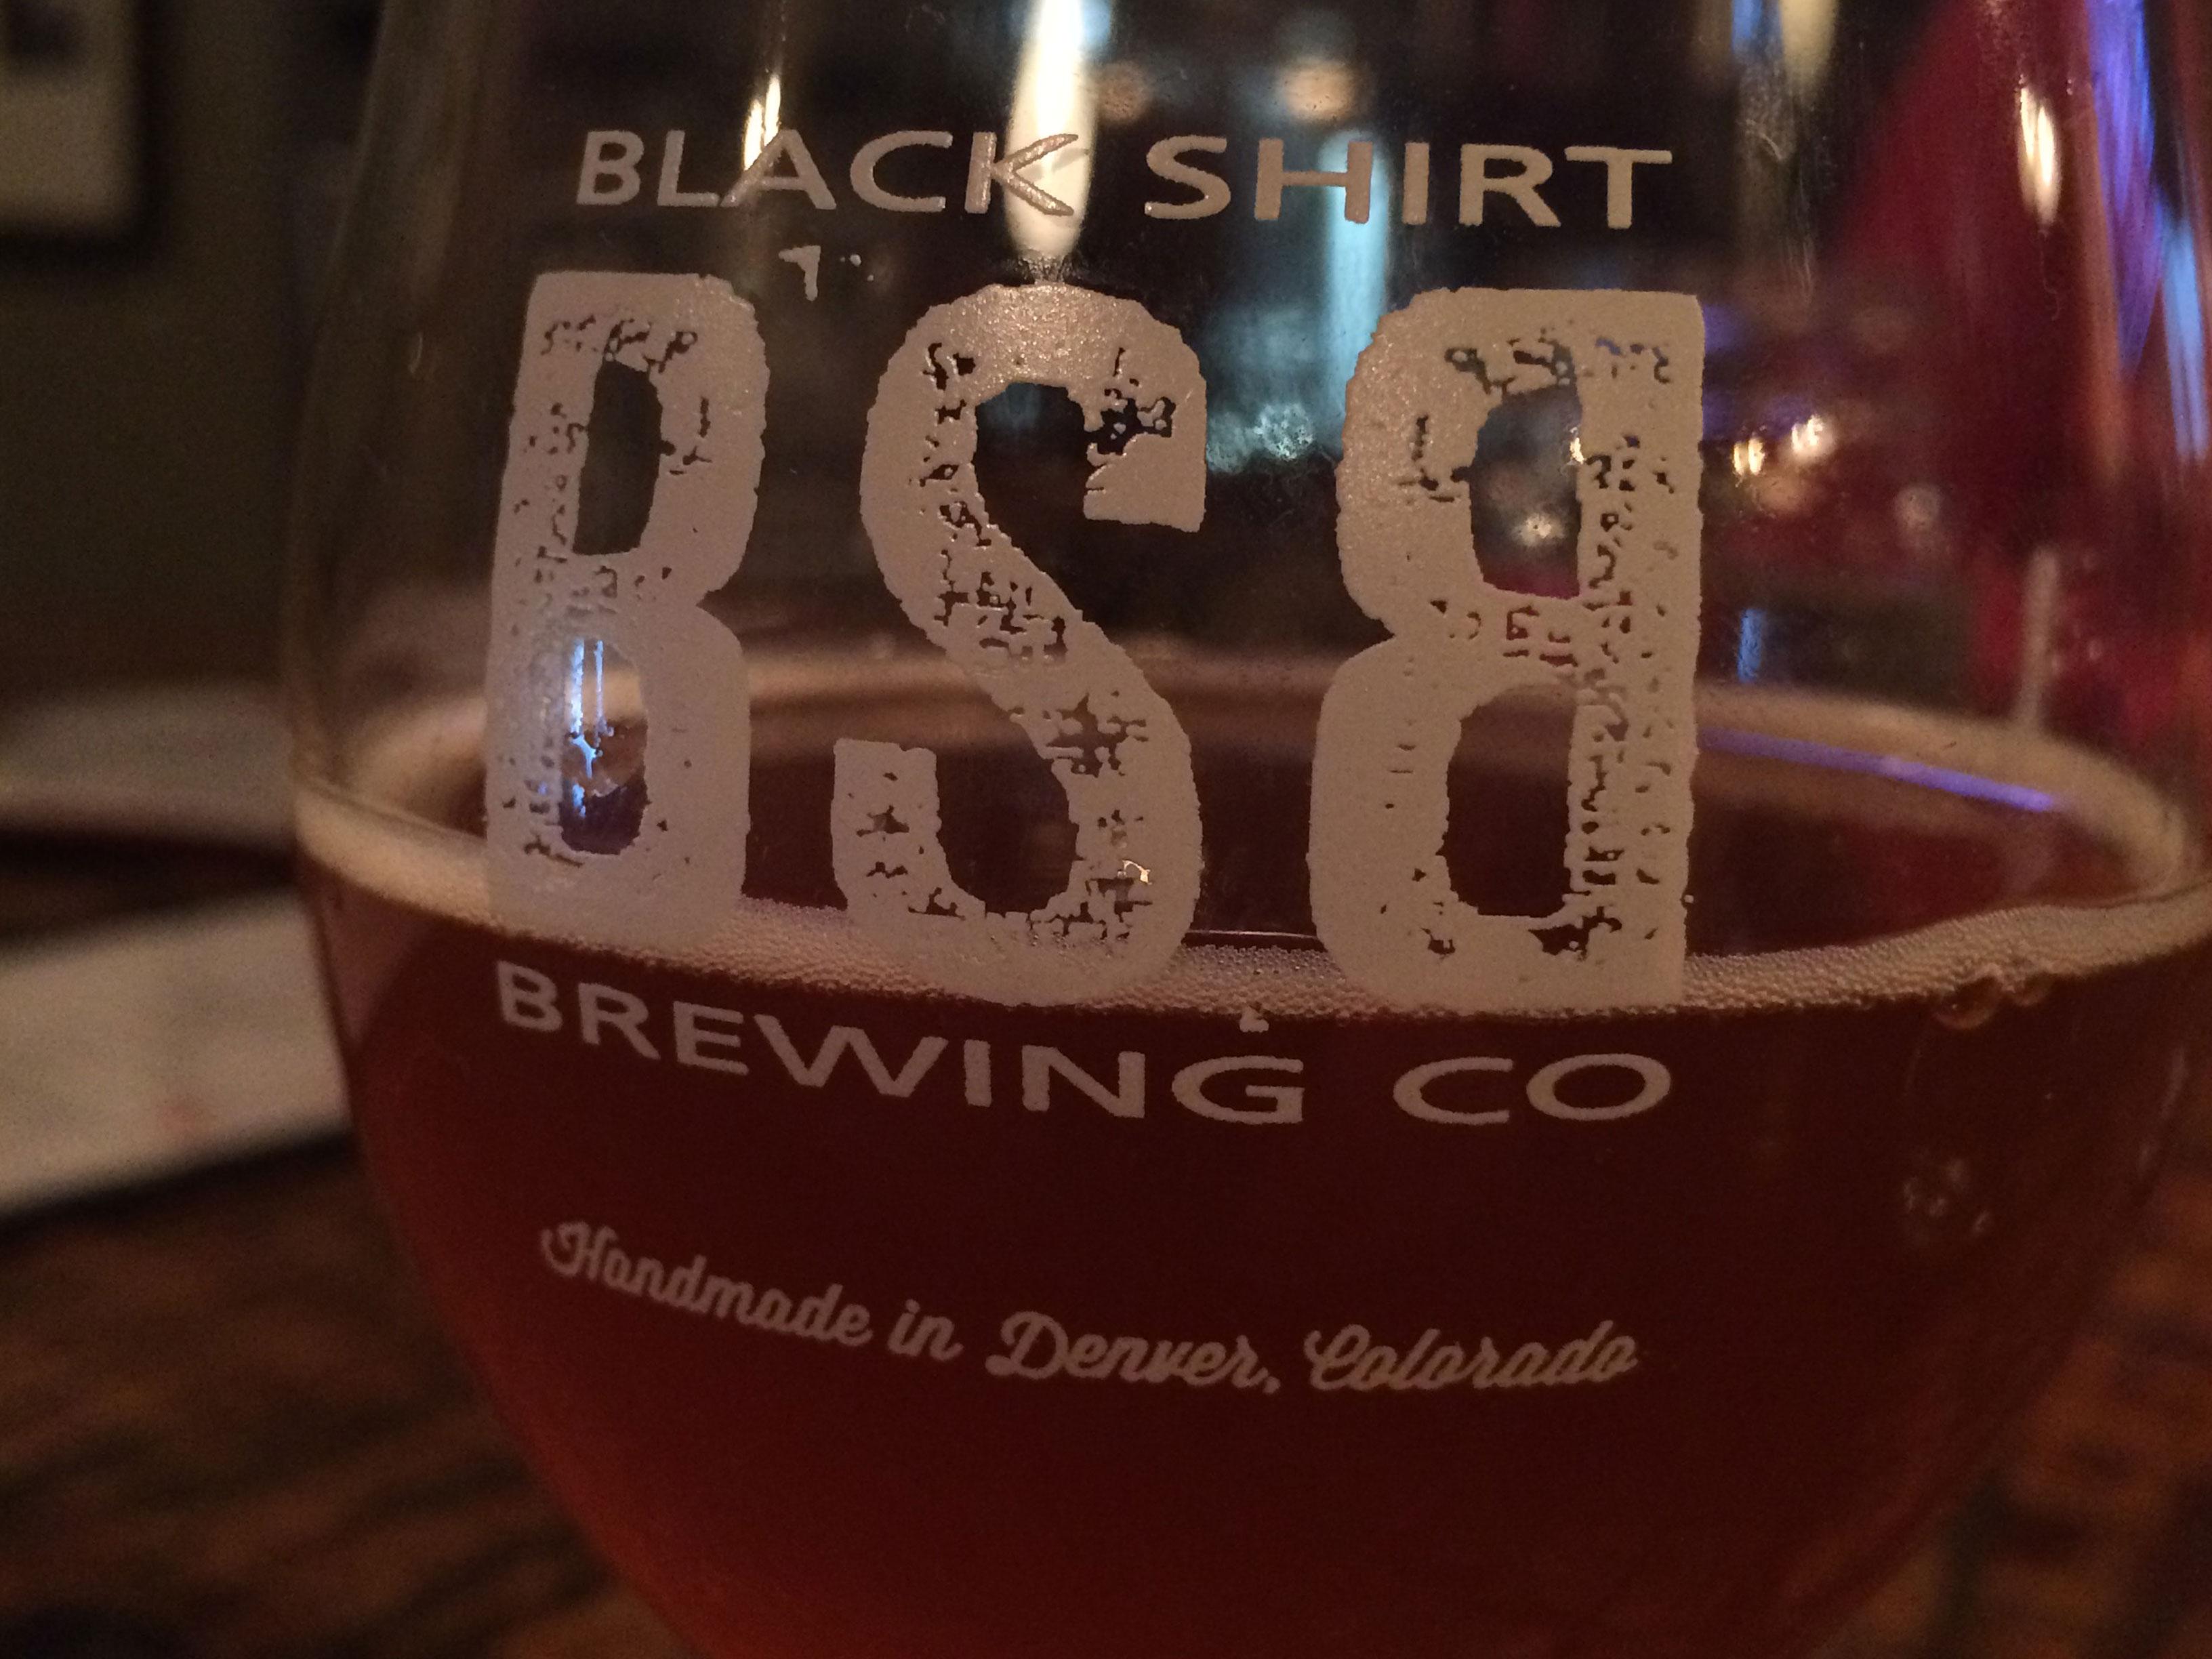 beer-black_shirt_brewery-denver_co-bar-microbrewery-tf_2016__7_